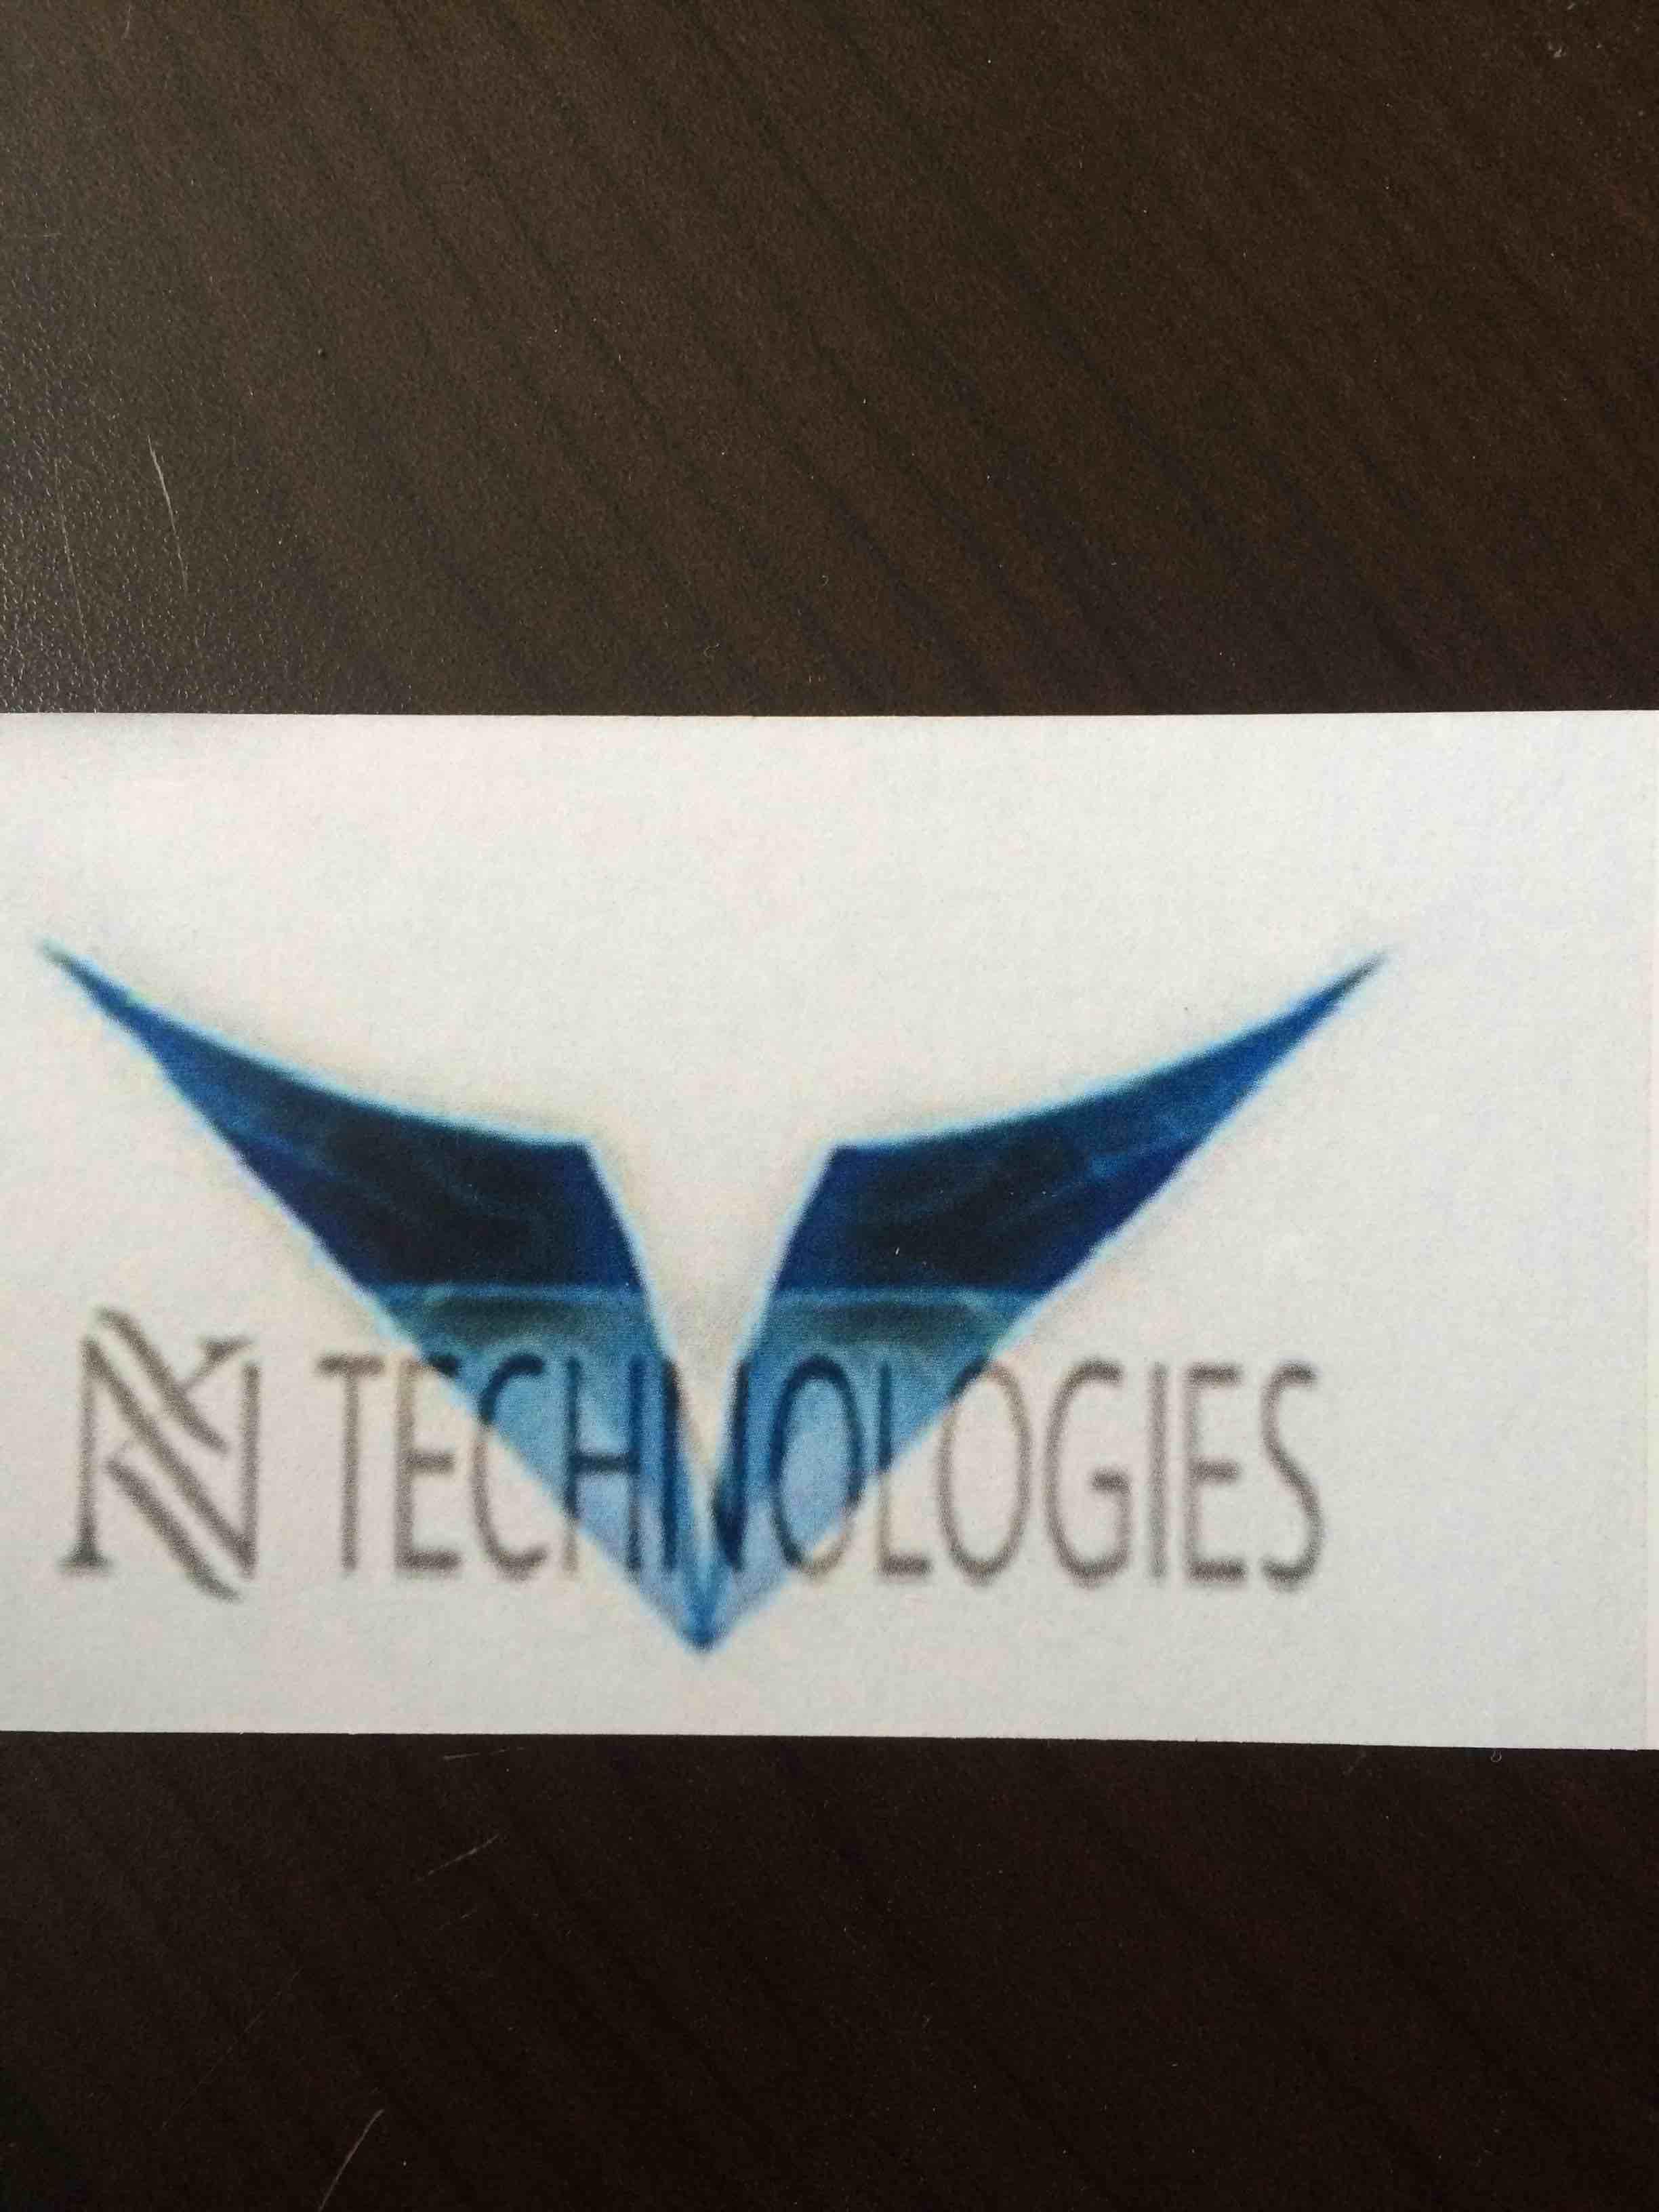 N K Technologies